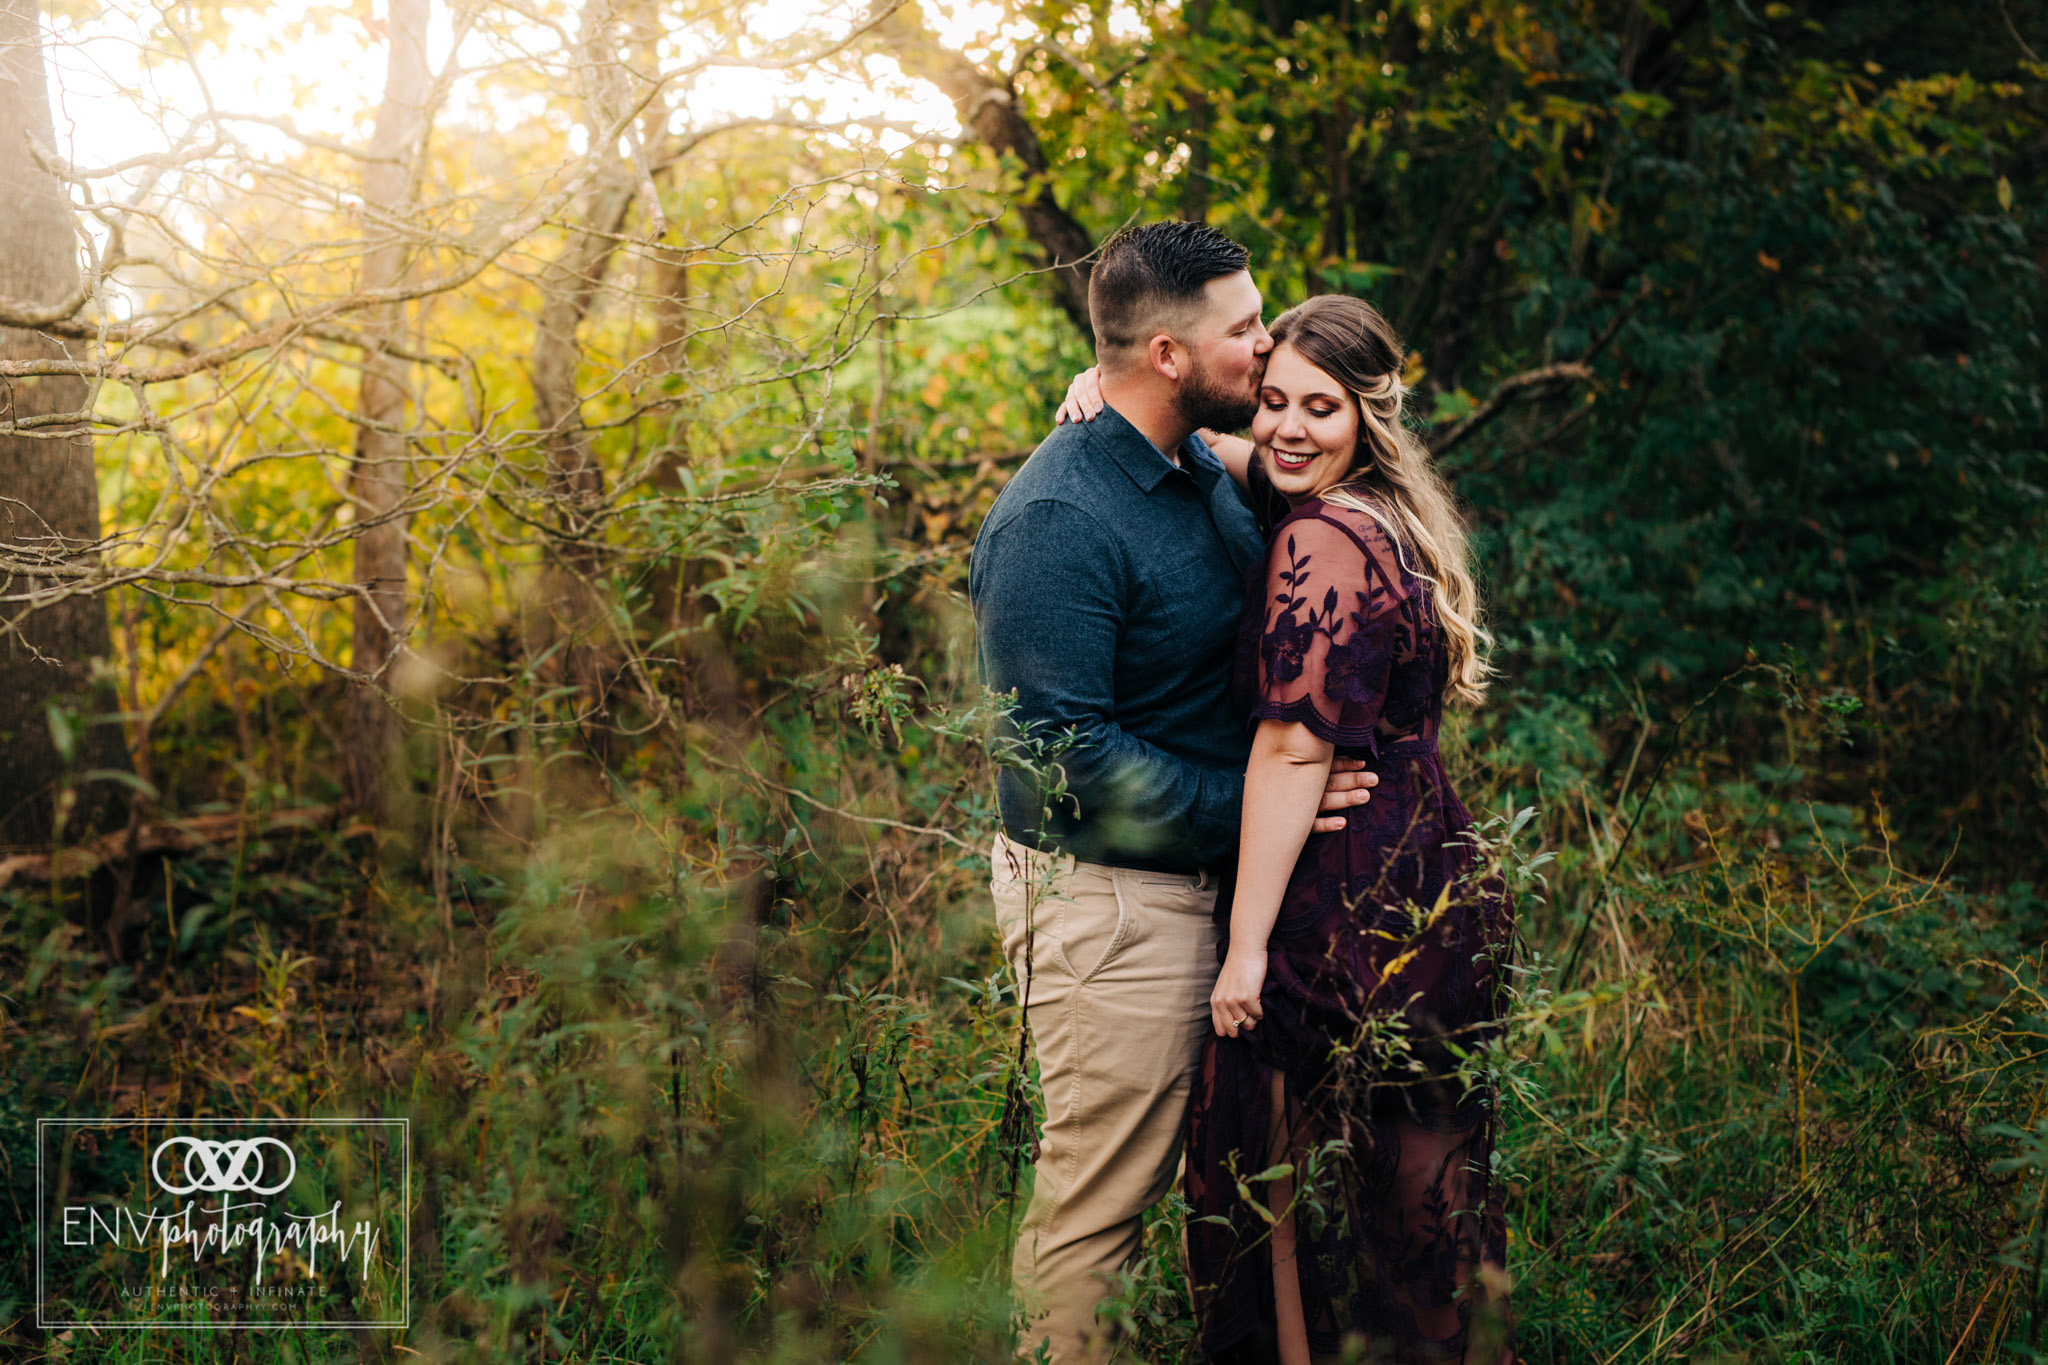 columbus ohio mount vernon ohio engagement photographer 2018 (4).jpg